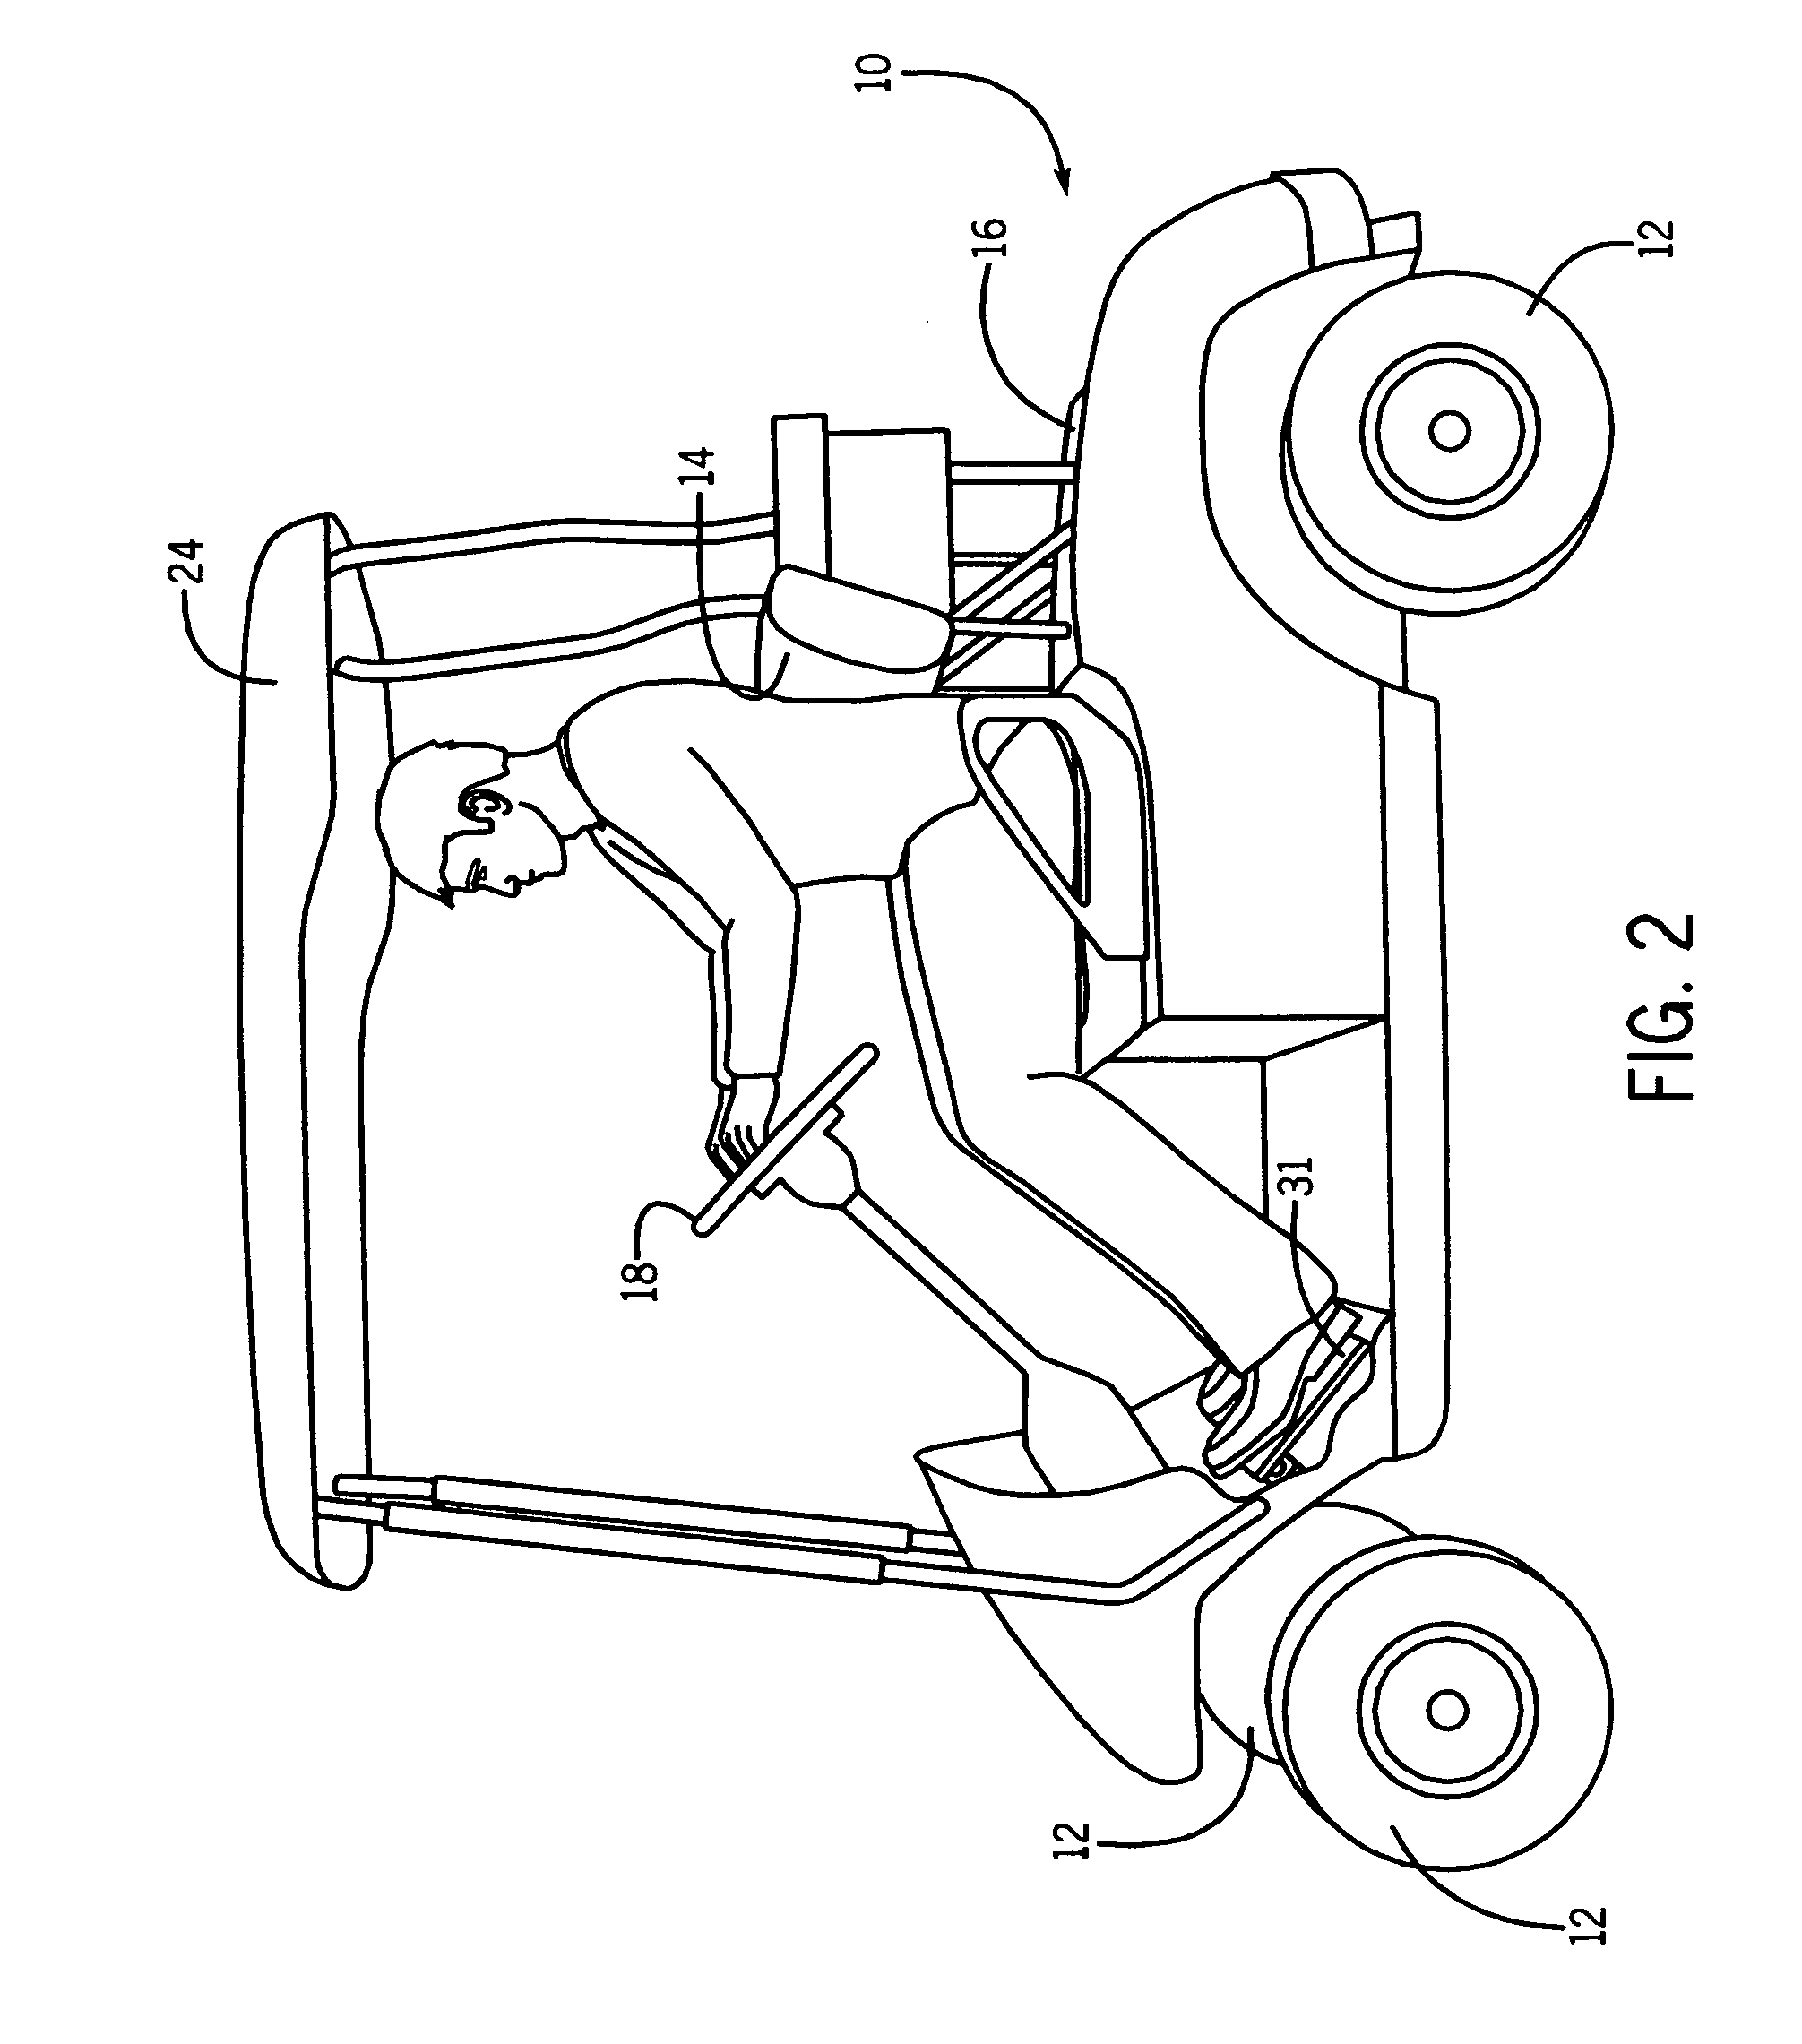 club car wiring diagram manual wiring diagram and schematic design golf cart wiring diagram 48v mpt 1000 car